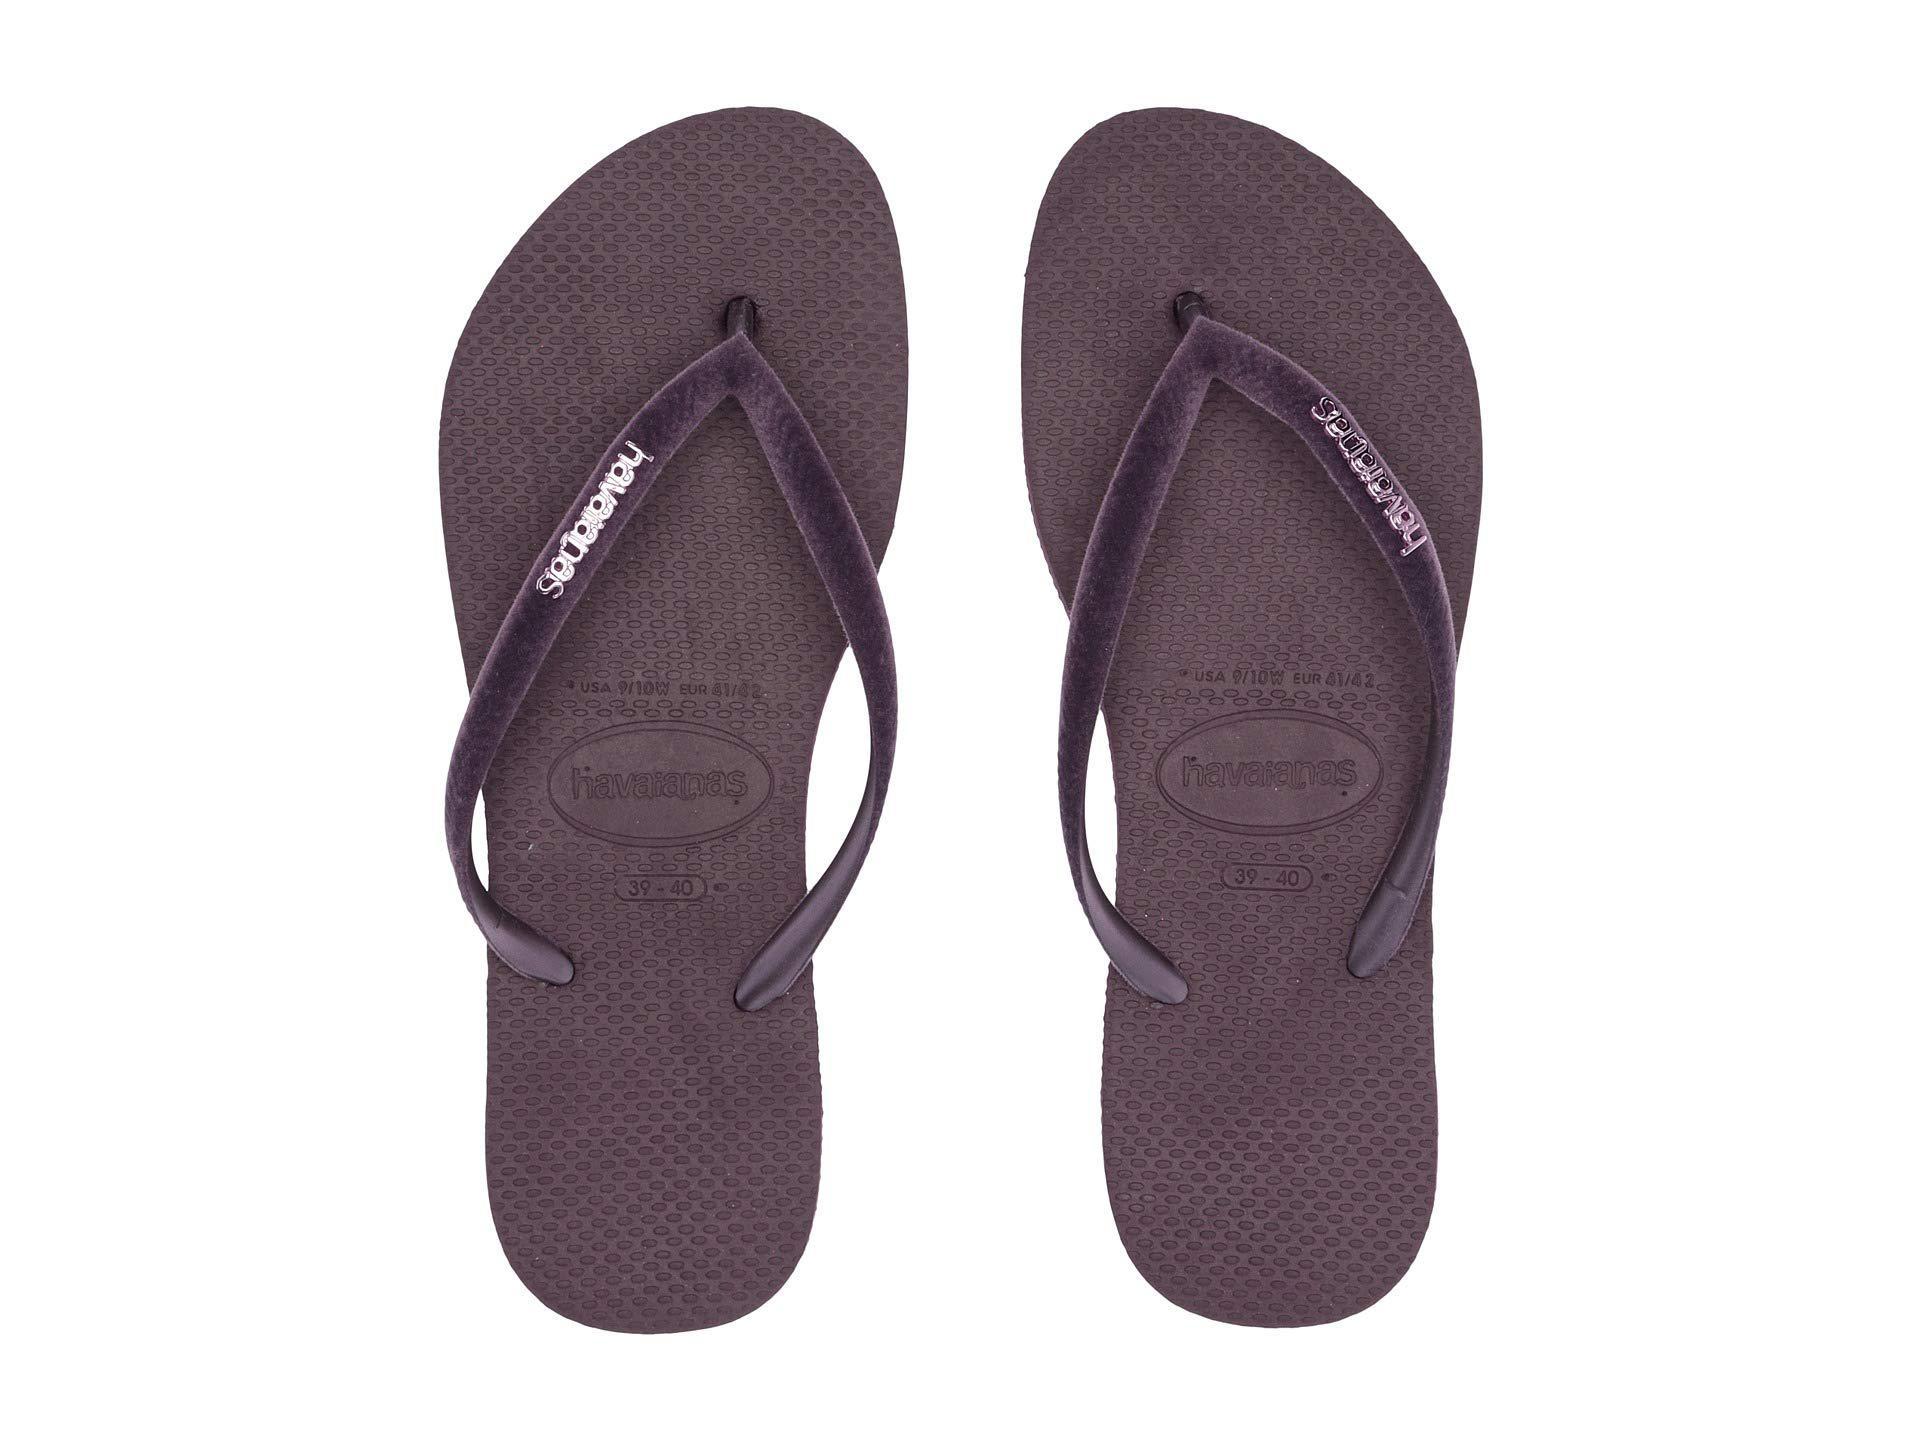 18beb0f30230 Havaianas - Blue Slim Velvet Flip-flops (aubergine) Women s Sandals - Lyst.  View fullscreen